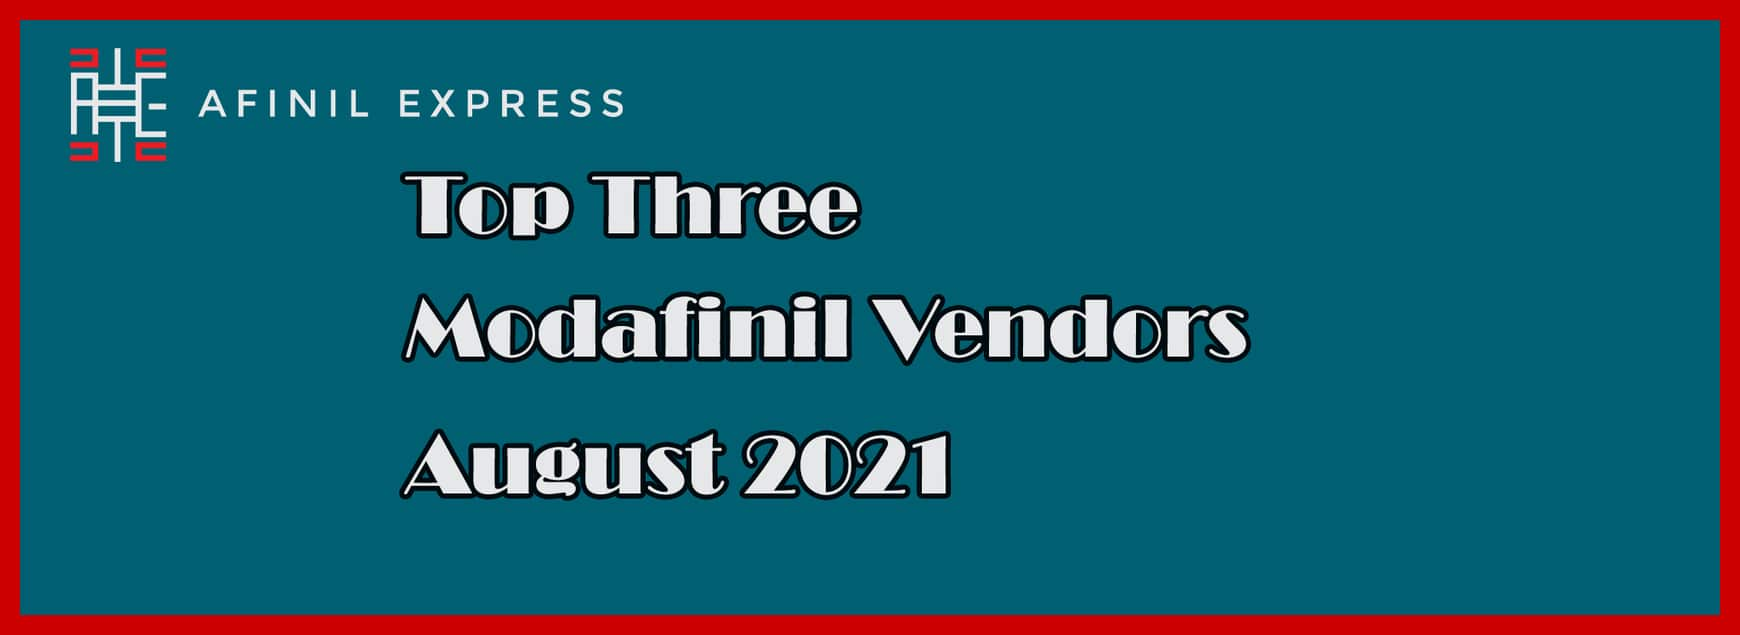 Top Three Modafinil Vendors August 2021